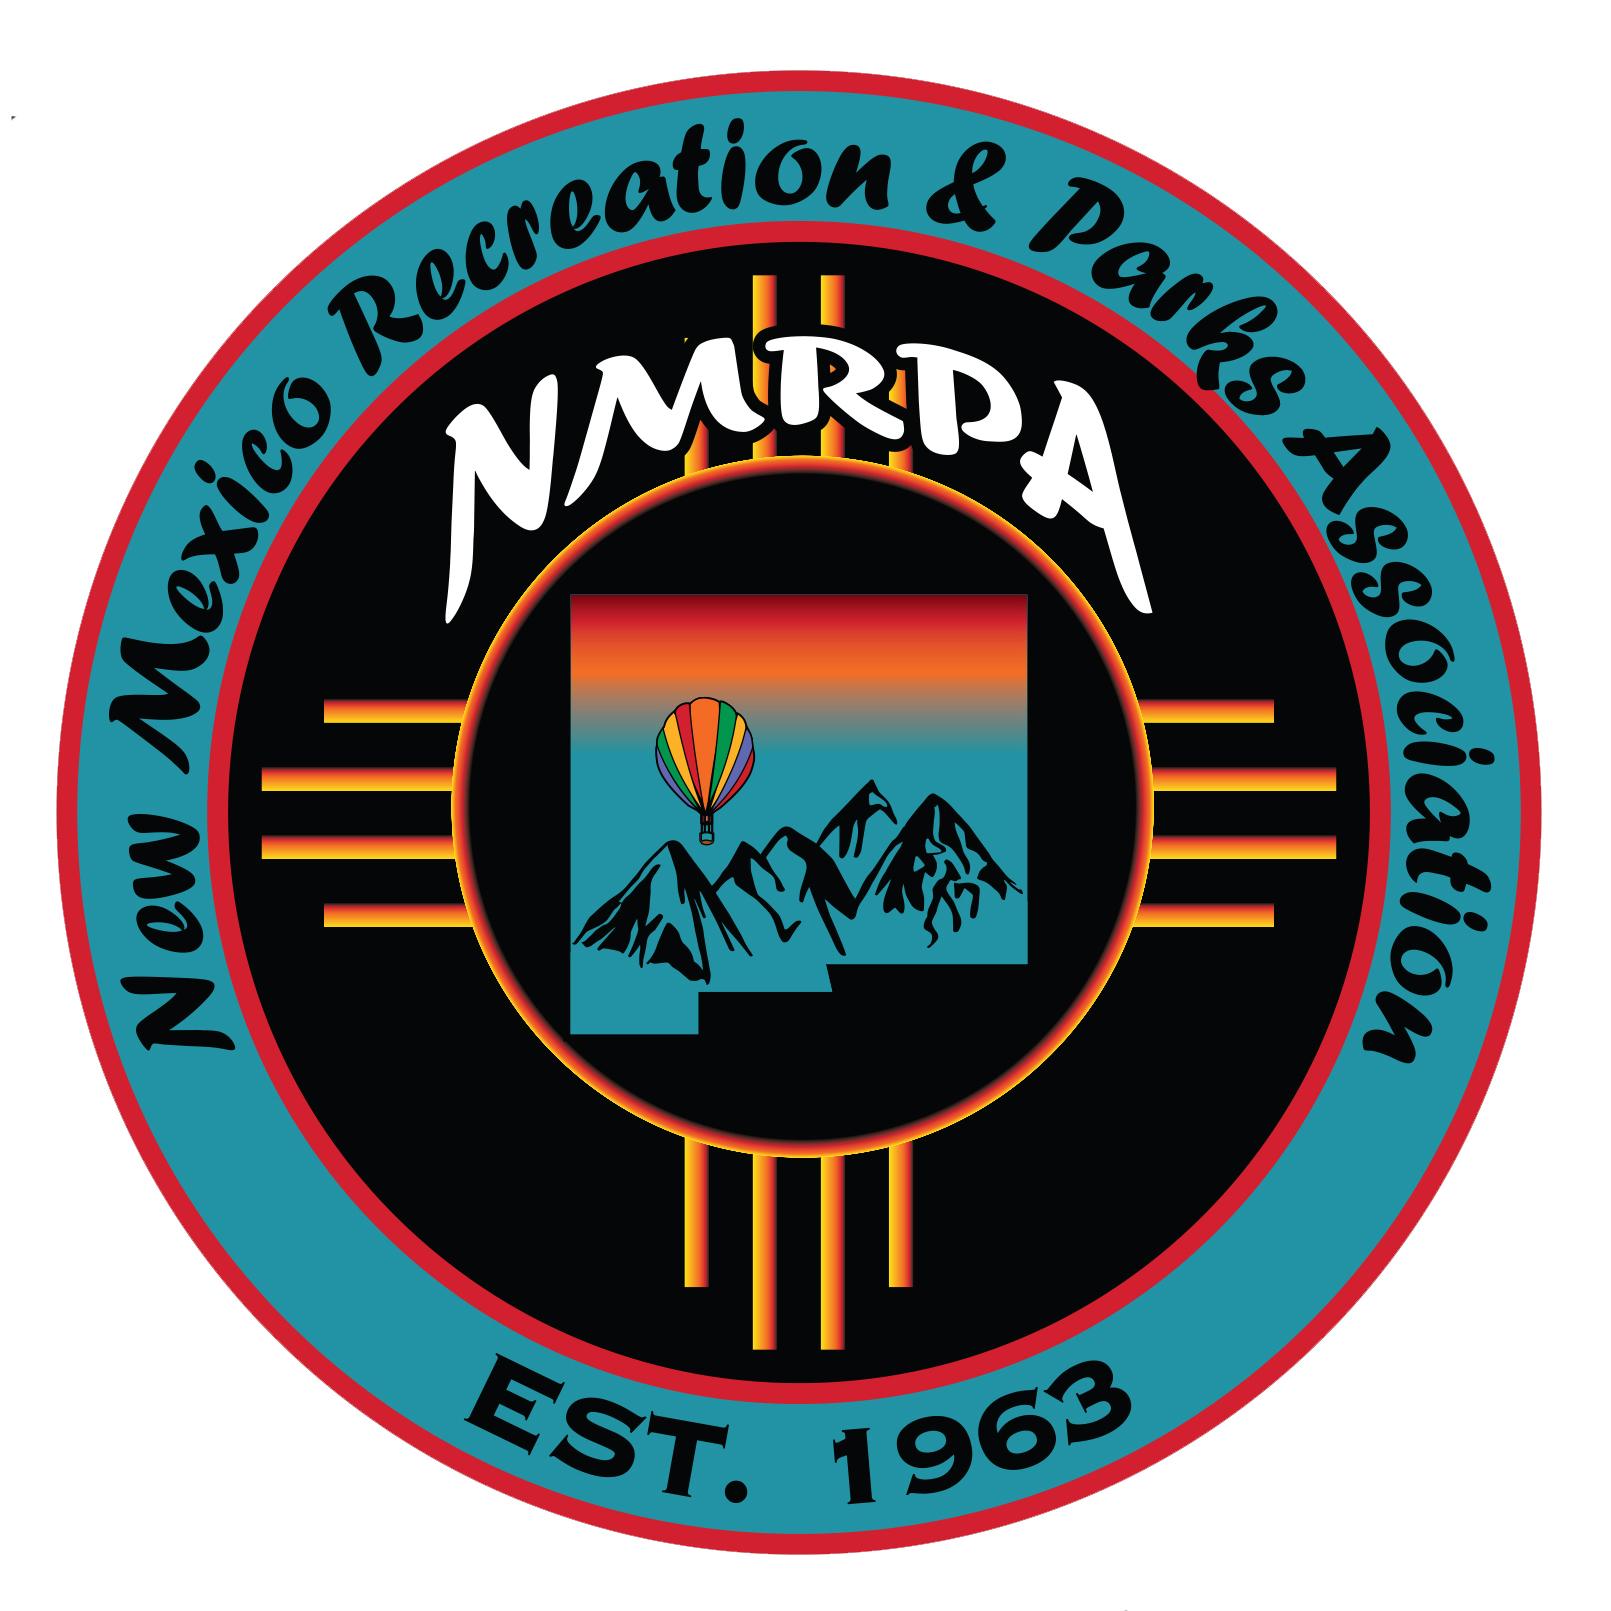 New NMRPA logo